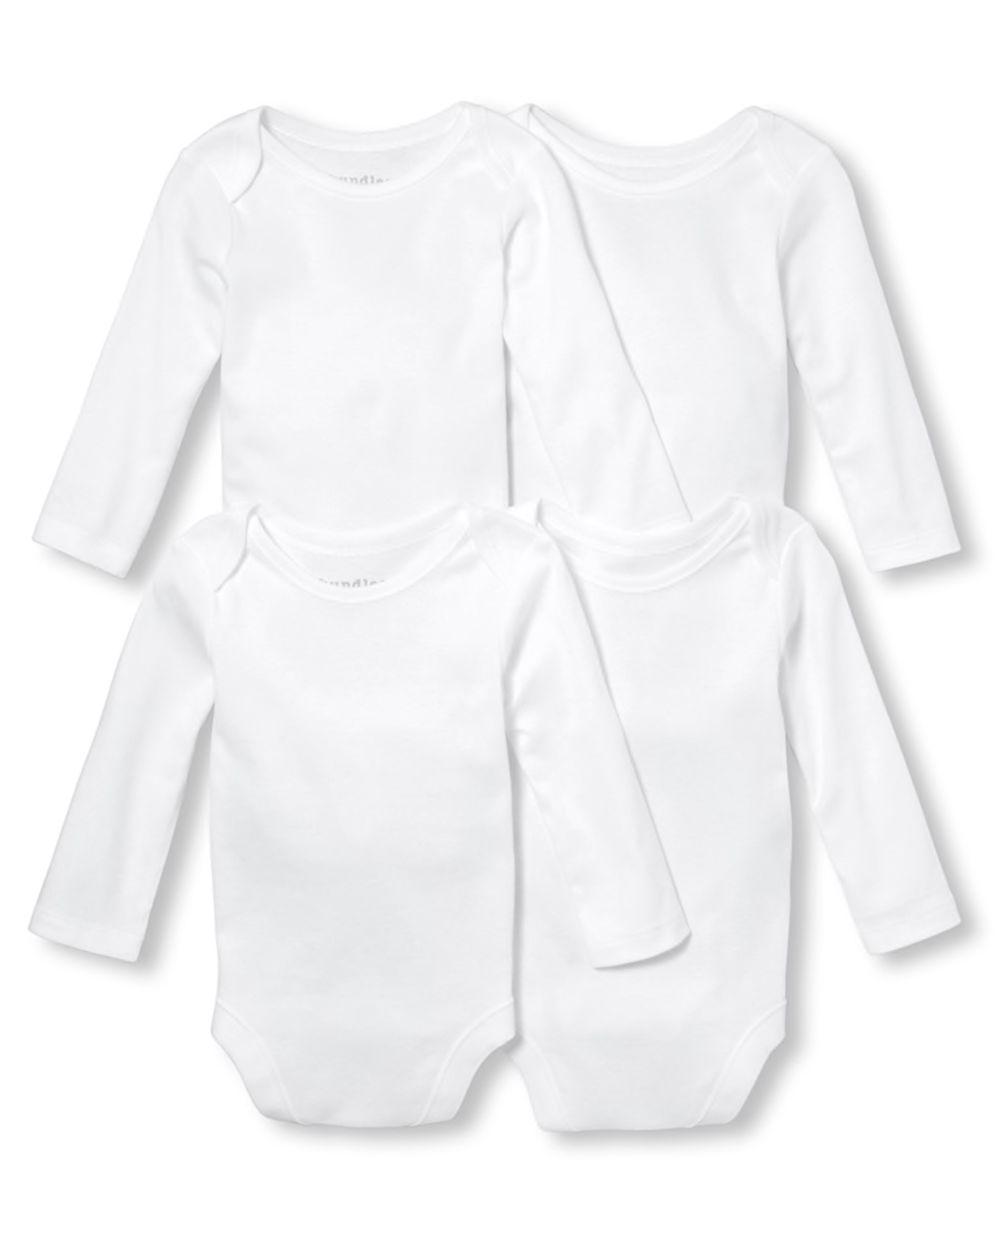 Unisex Baby Bodysuit 4-Pack